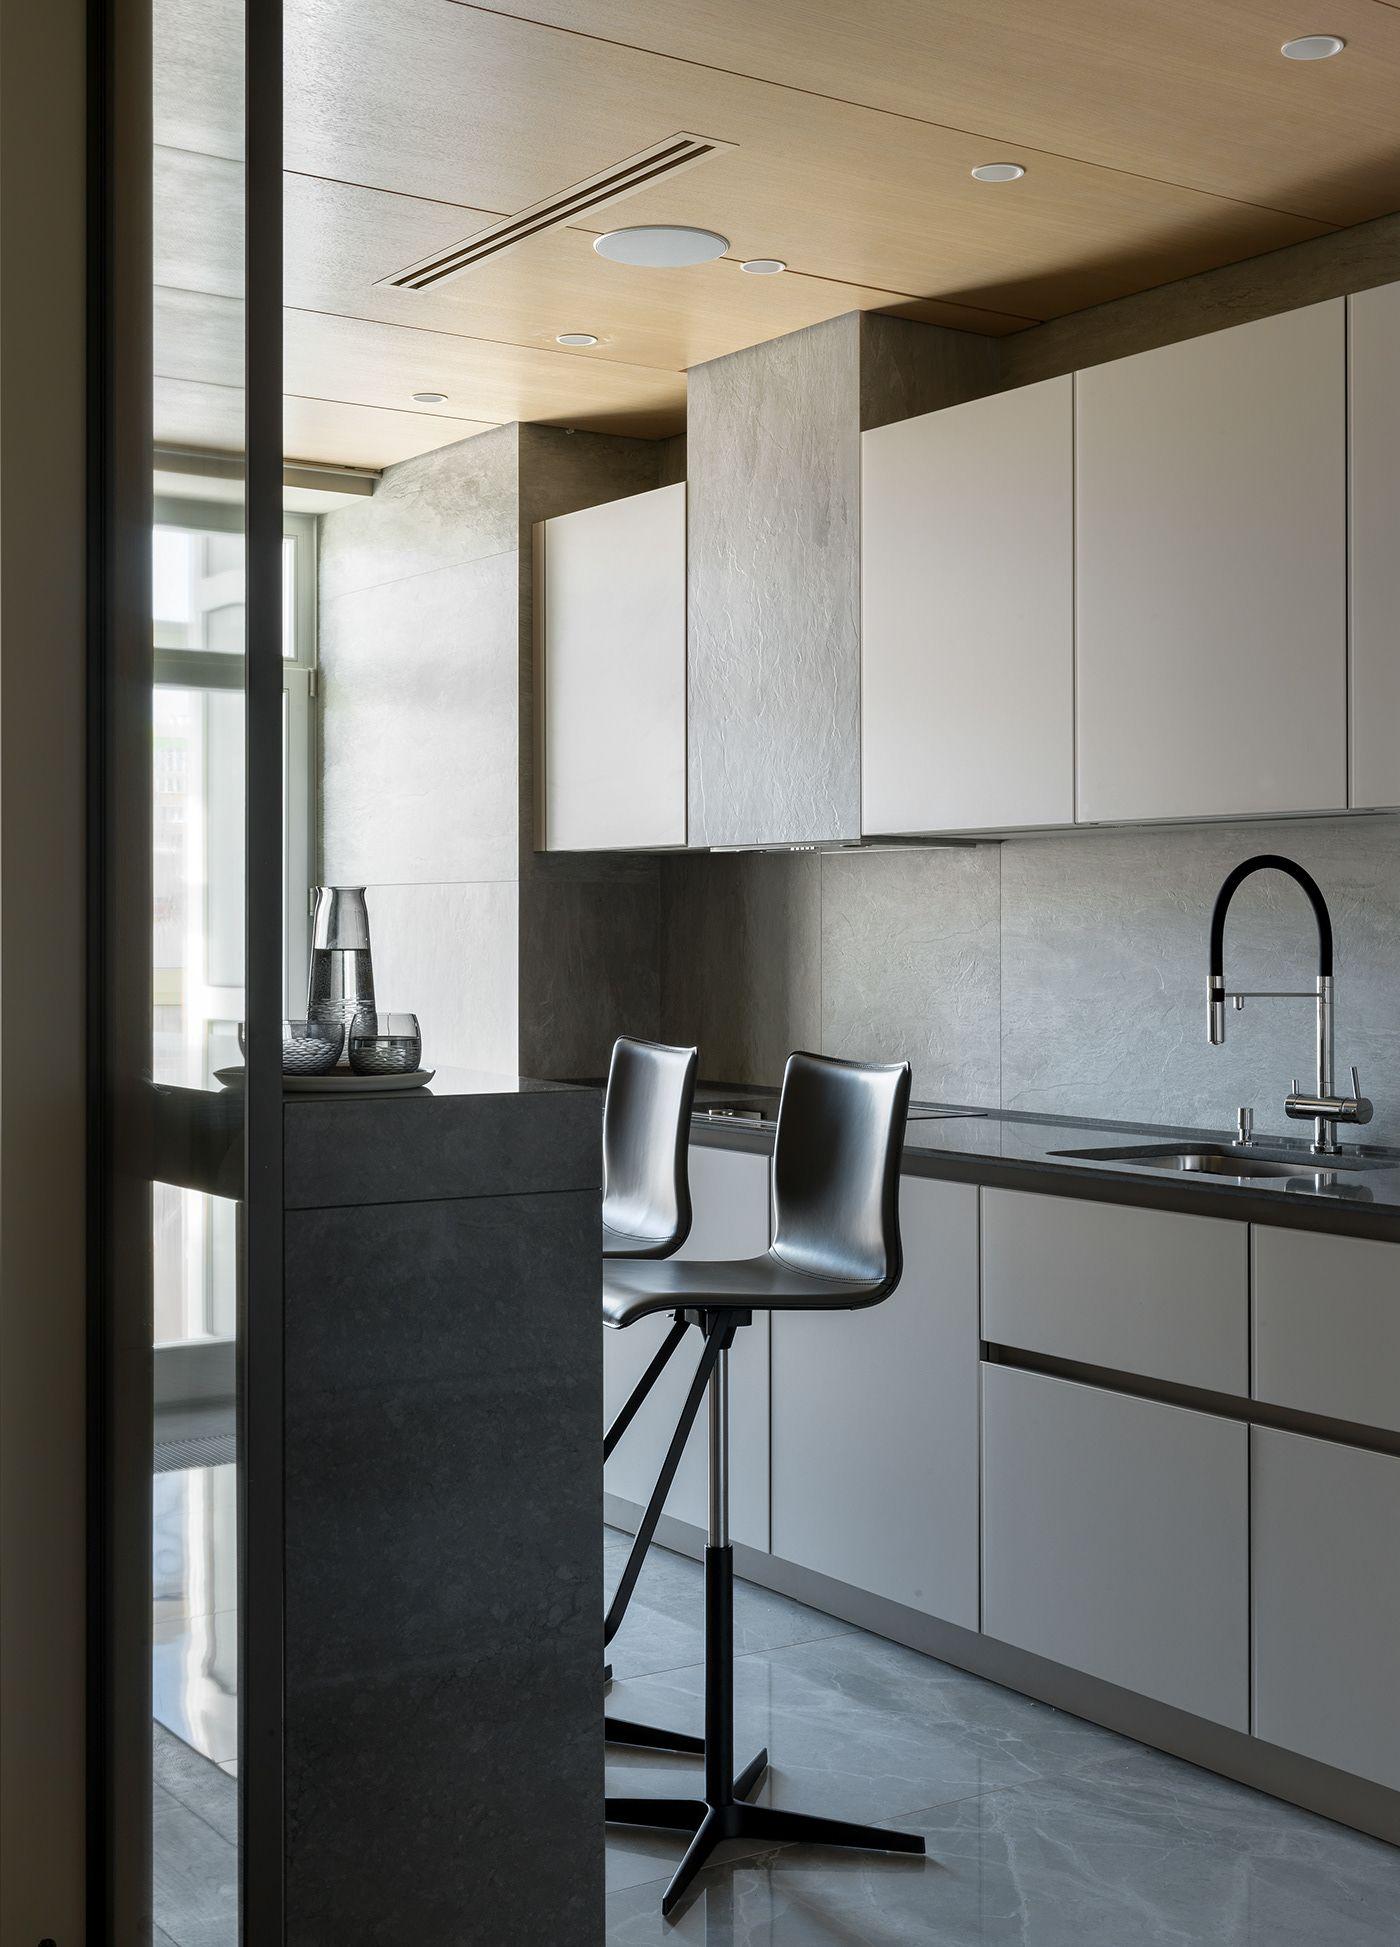 Nordic apartments on Behance | Интерьер, Идеи интерьера ...